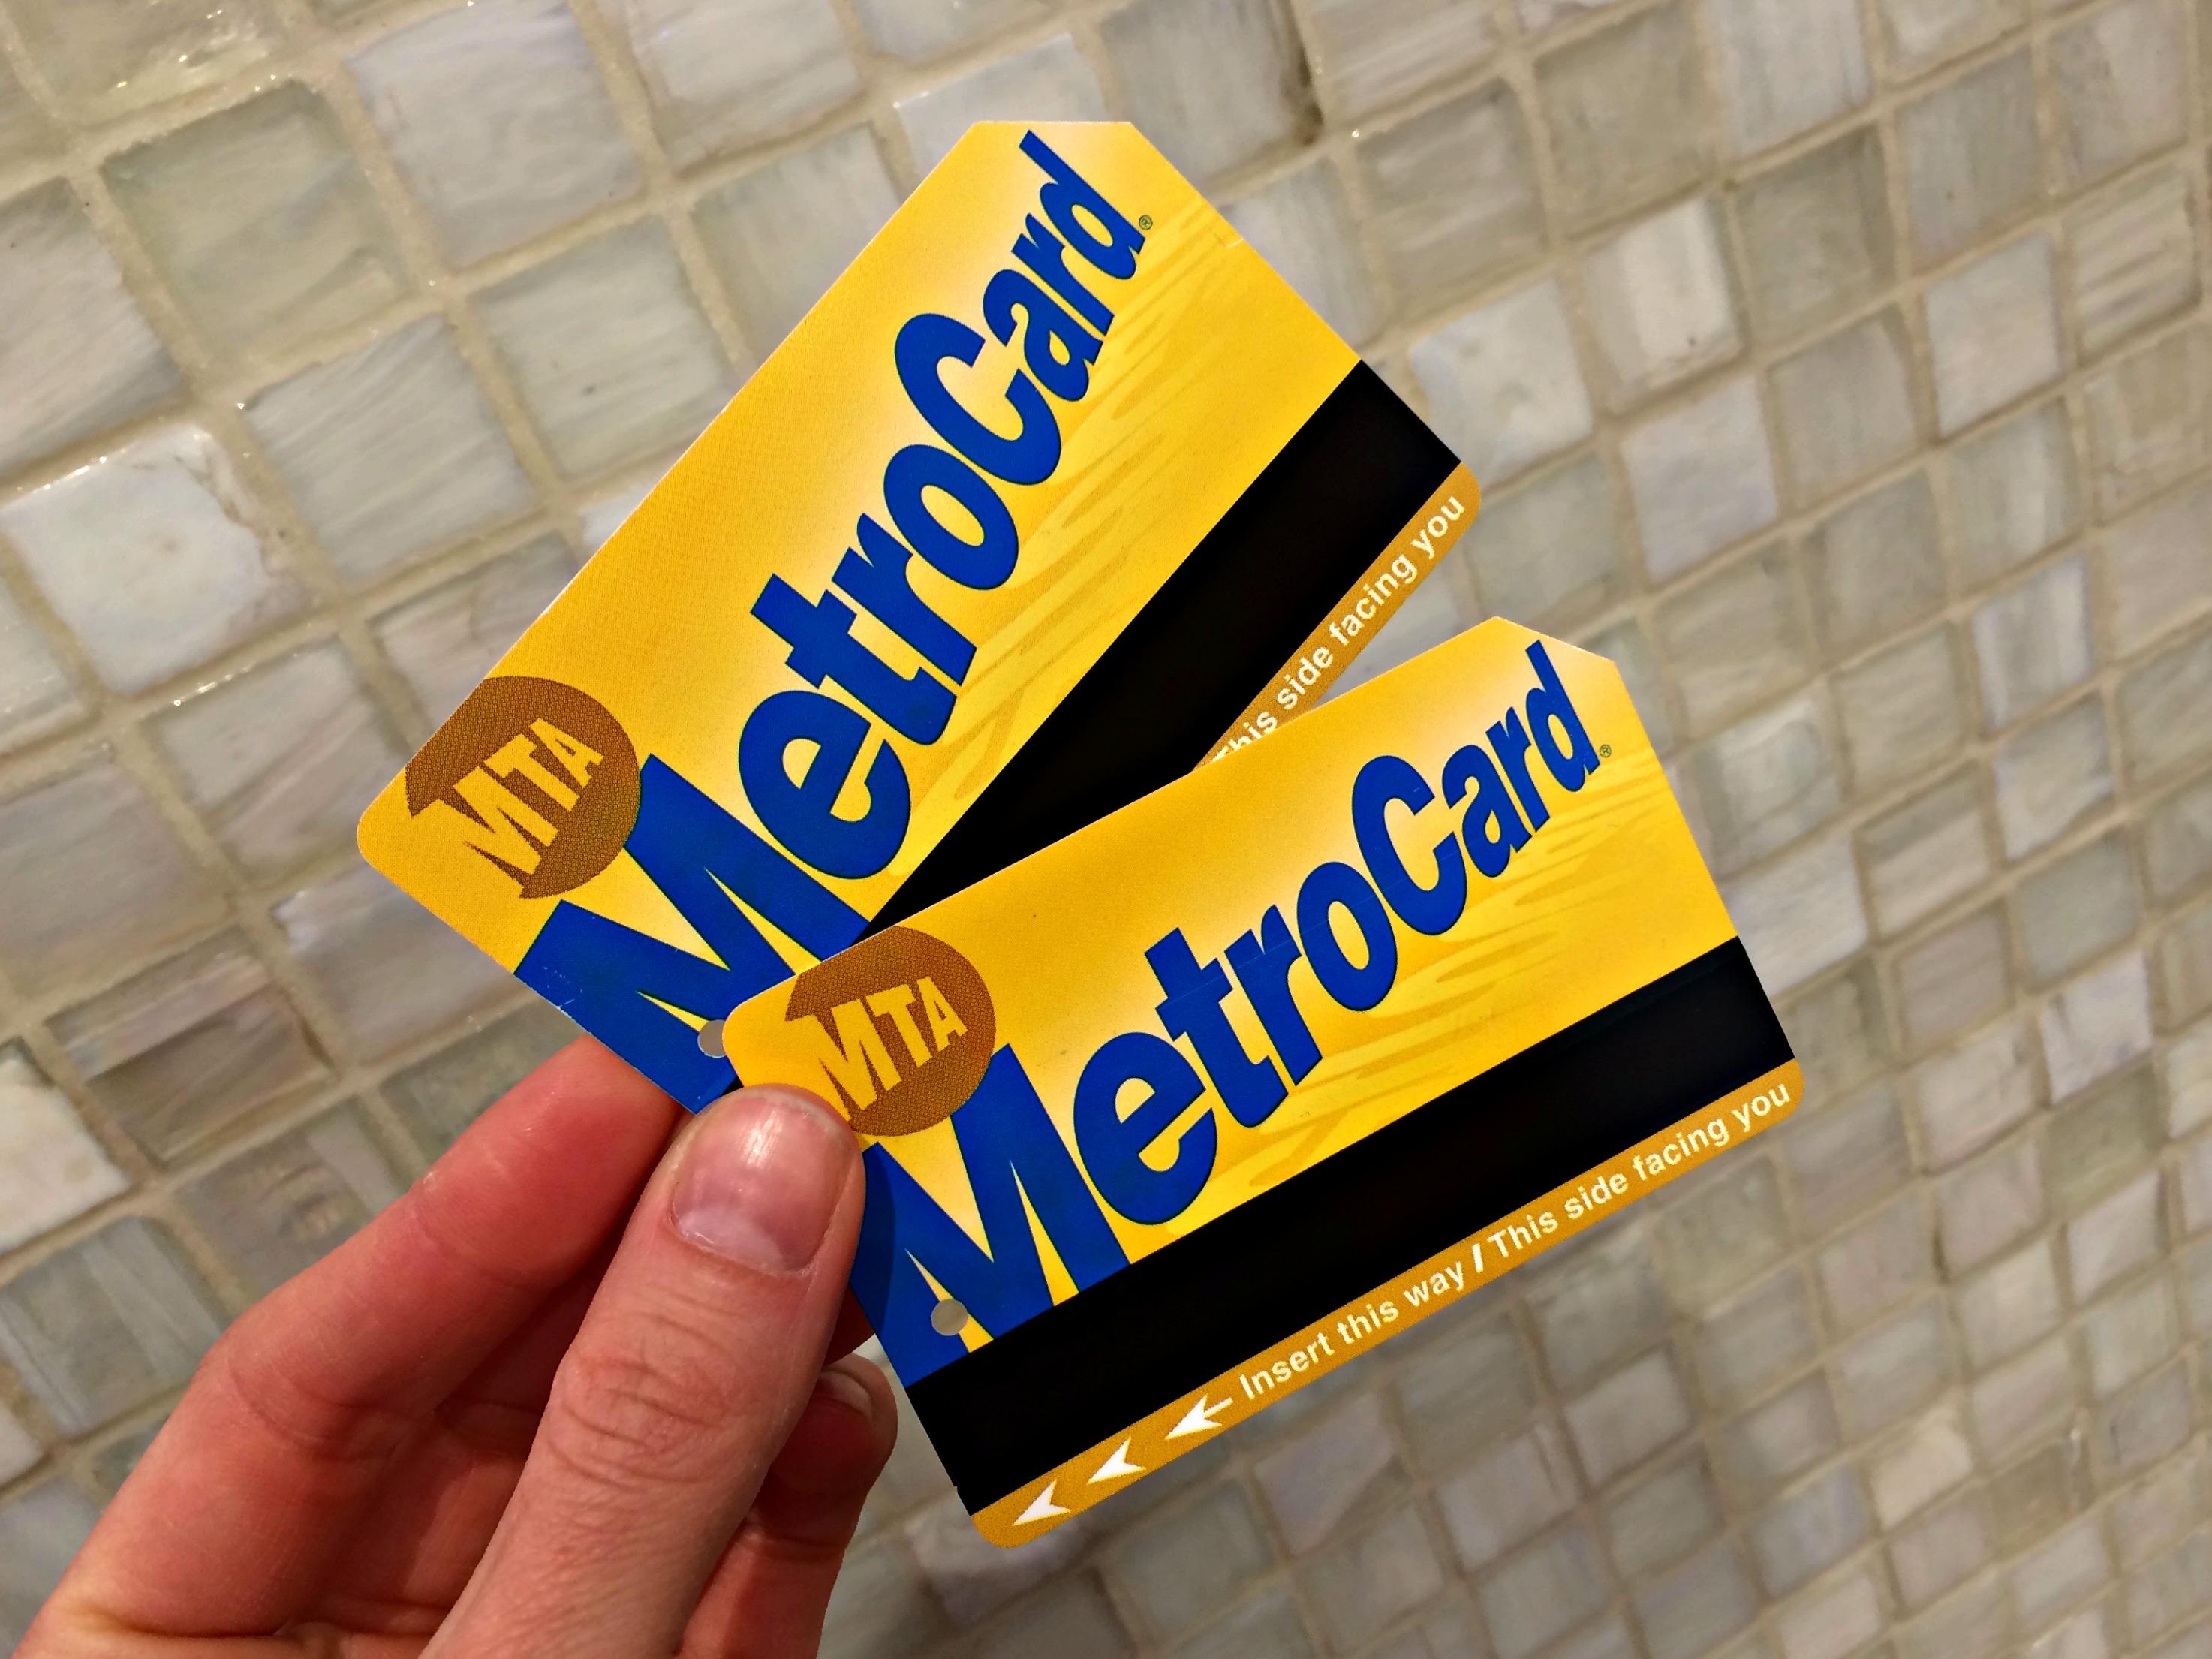 MetroCard nyc